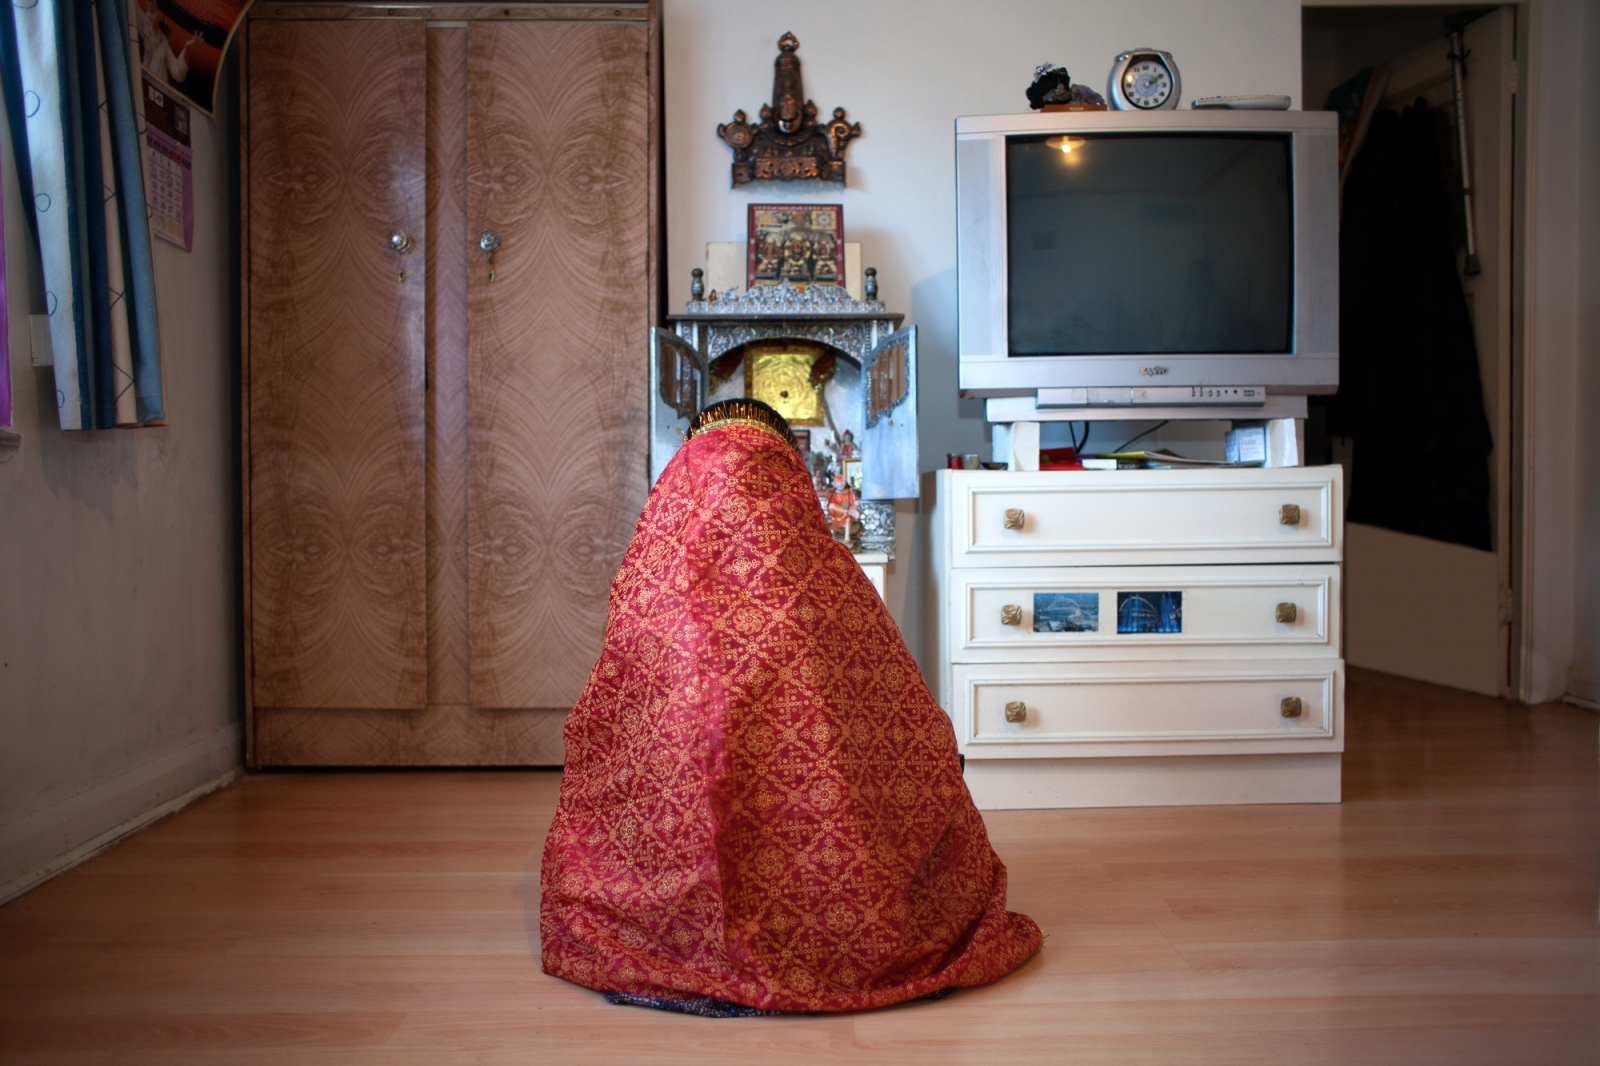 Wembley, UK, October 6, 2012: Shanta Ben Makwana, 63, prays at a tiny temple inside her apartment.